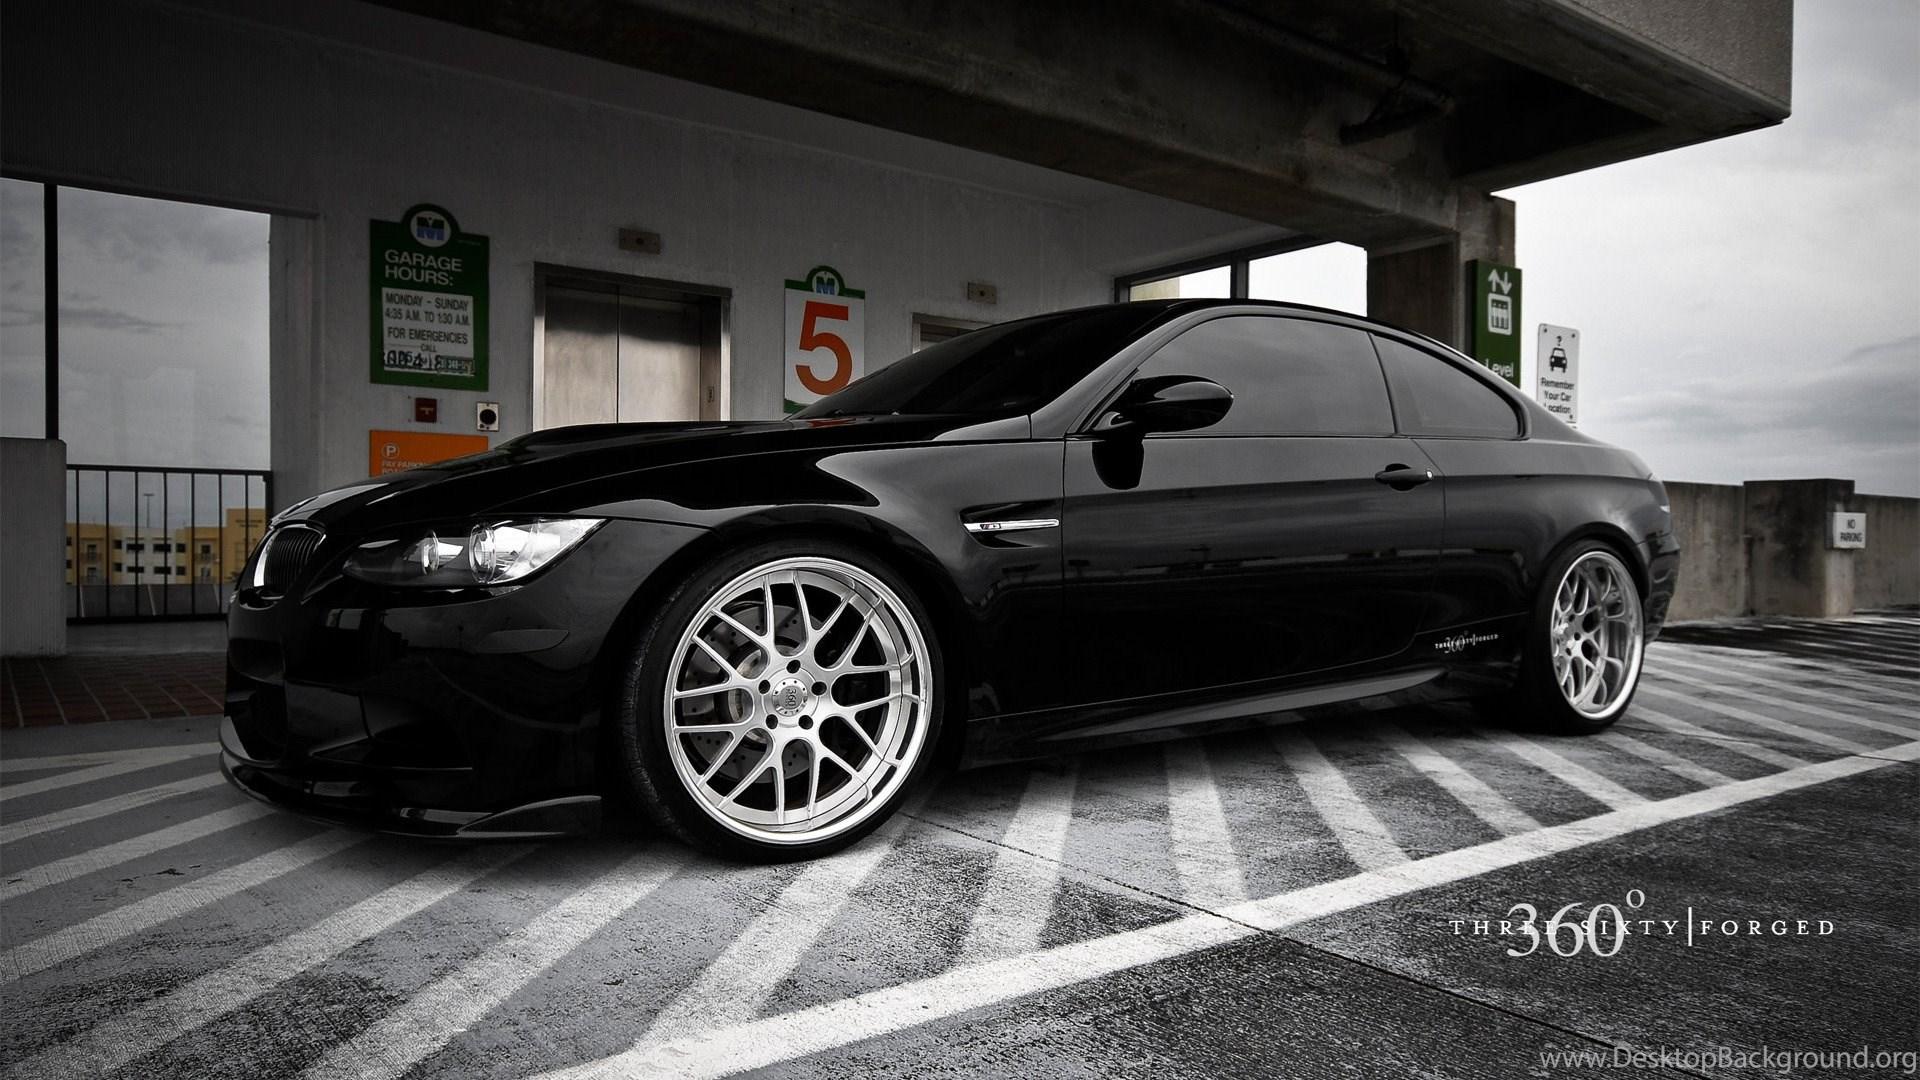 Bmw Cars Hd Wallpapers Free Download Bmwcase Bmw Car And Desktop